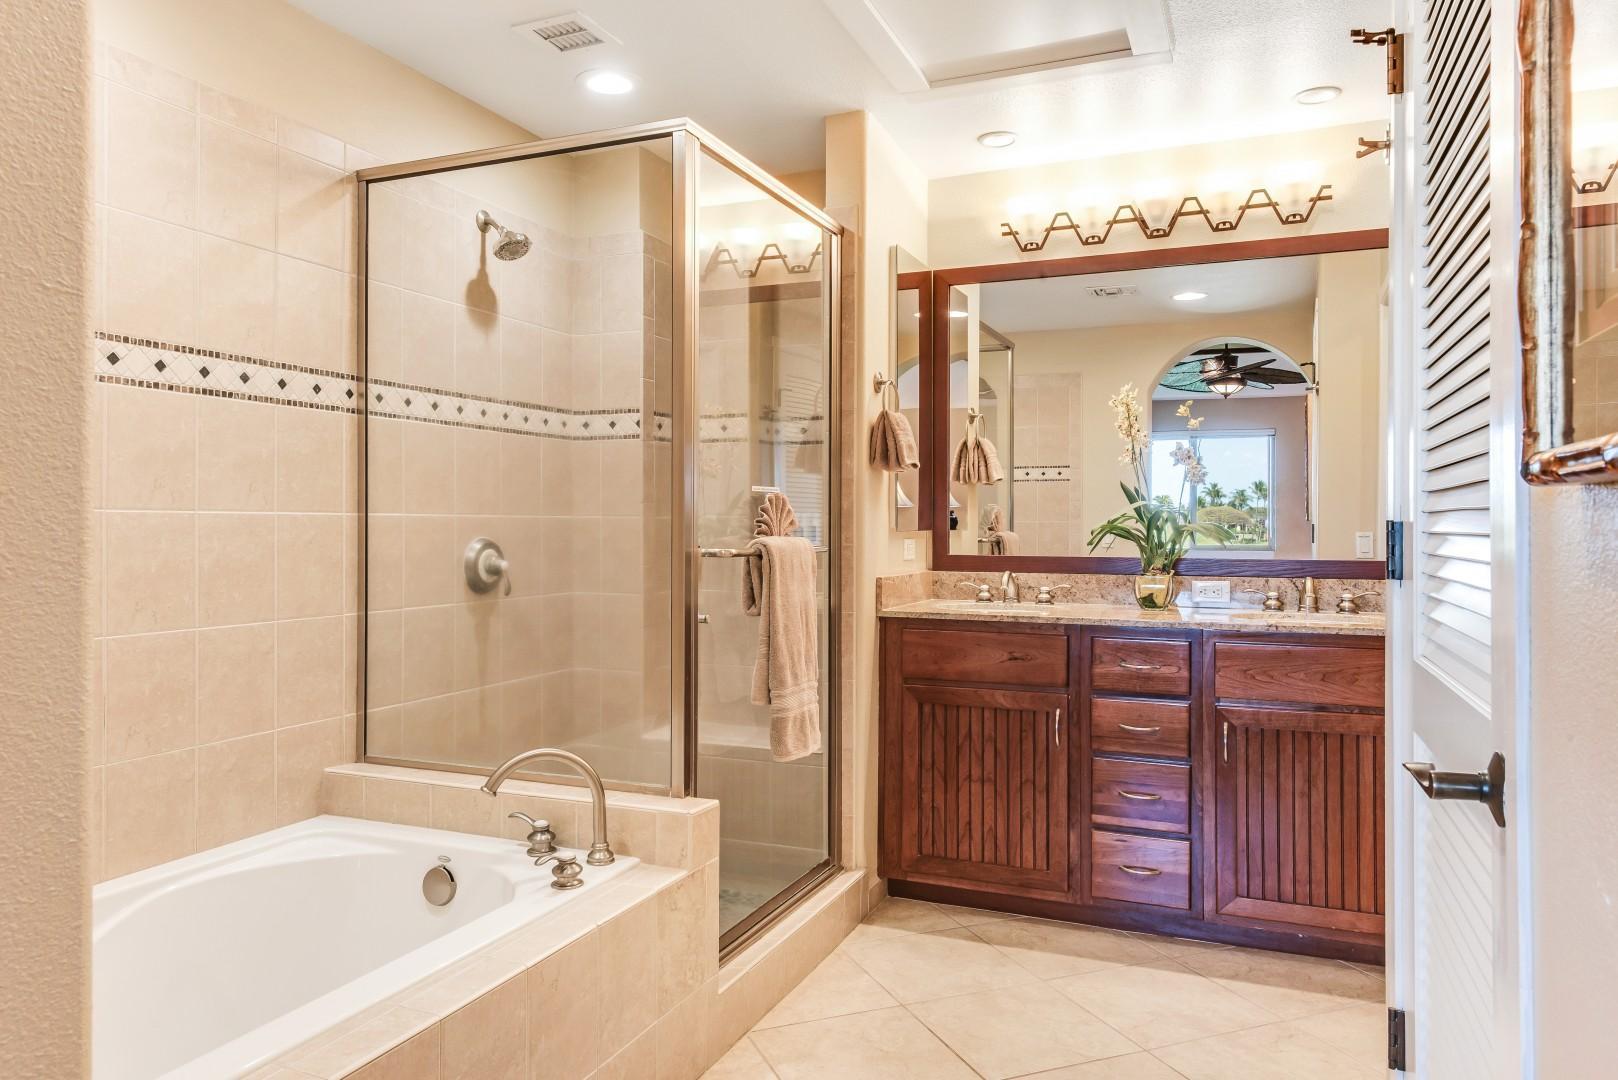 Beautiful Master Bath w/ Large Glass Shower, Soaking Tub, Dual Sinks, Separate WC & Walk-In Closet